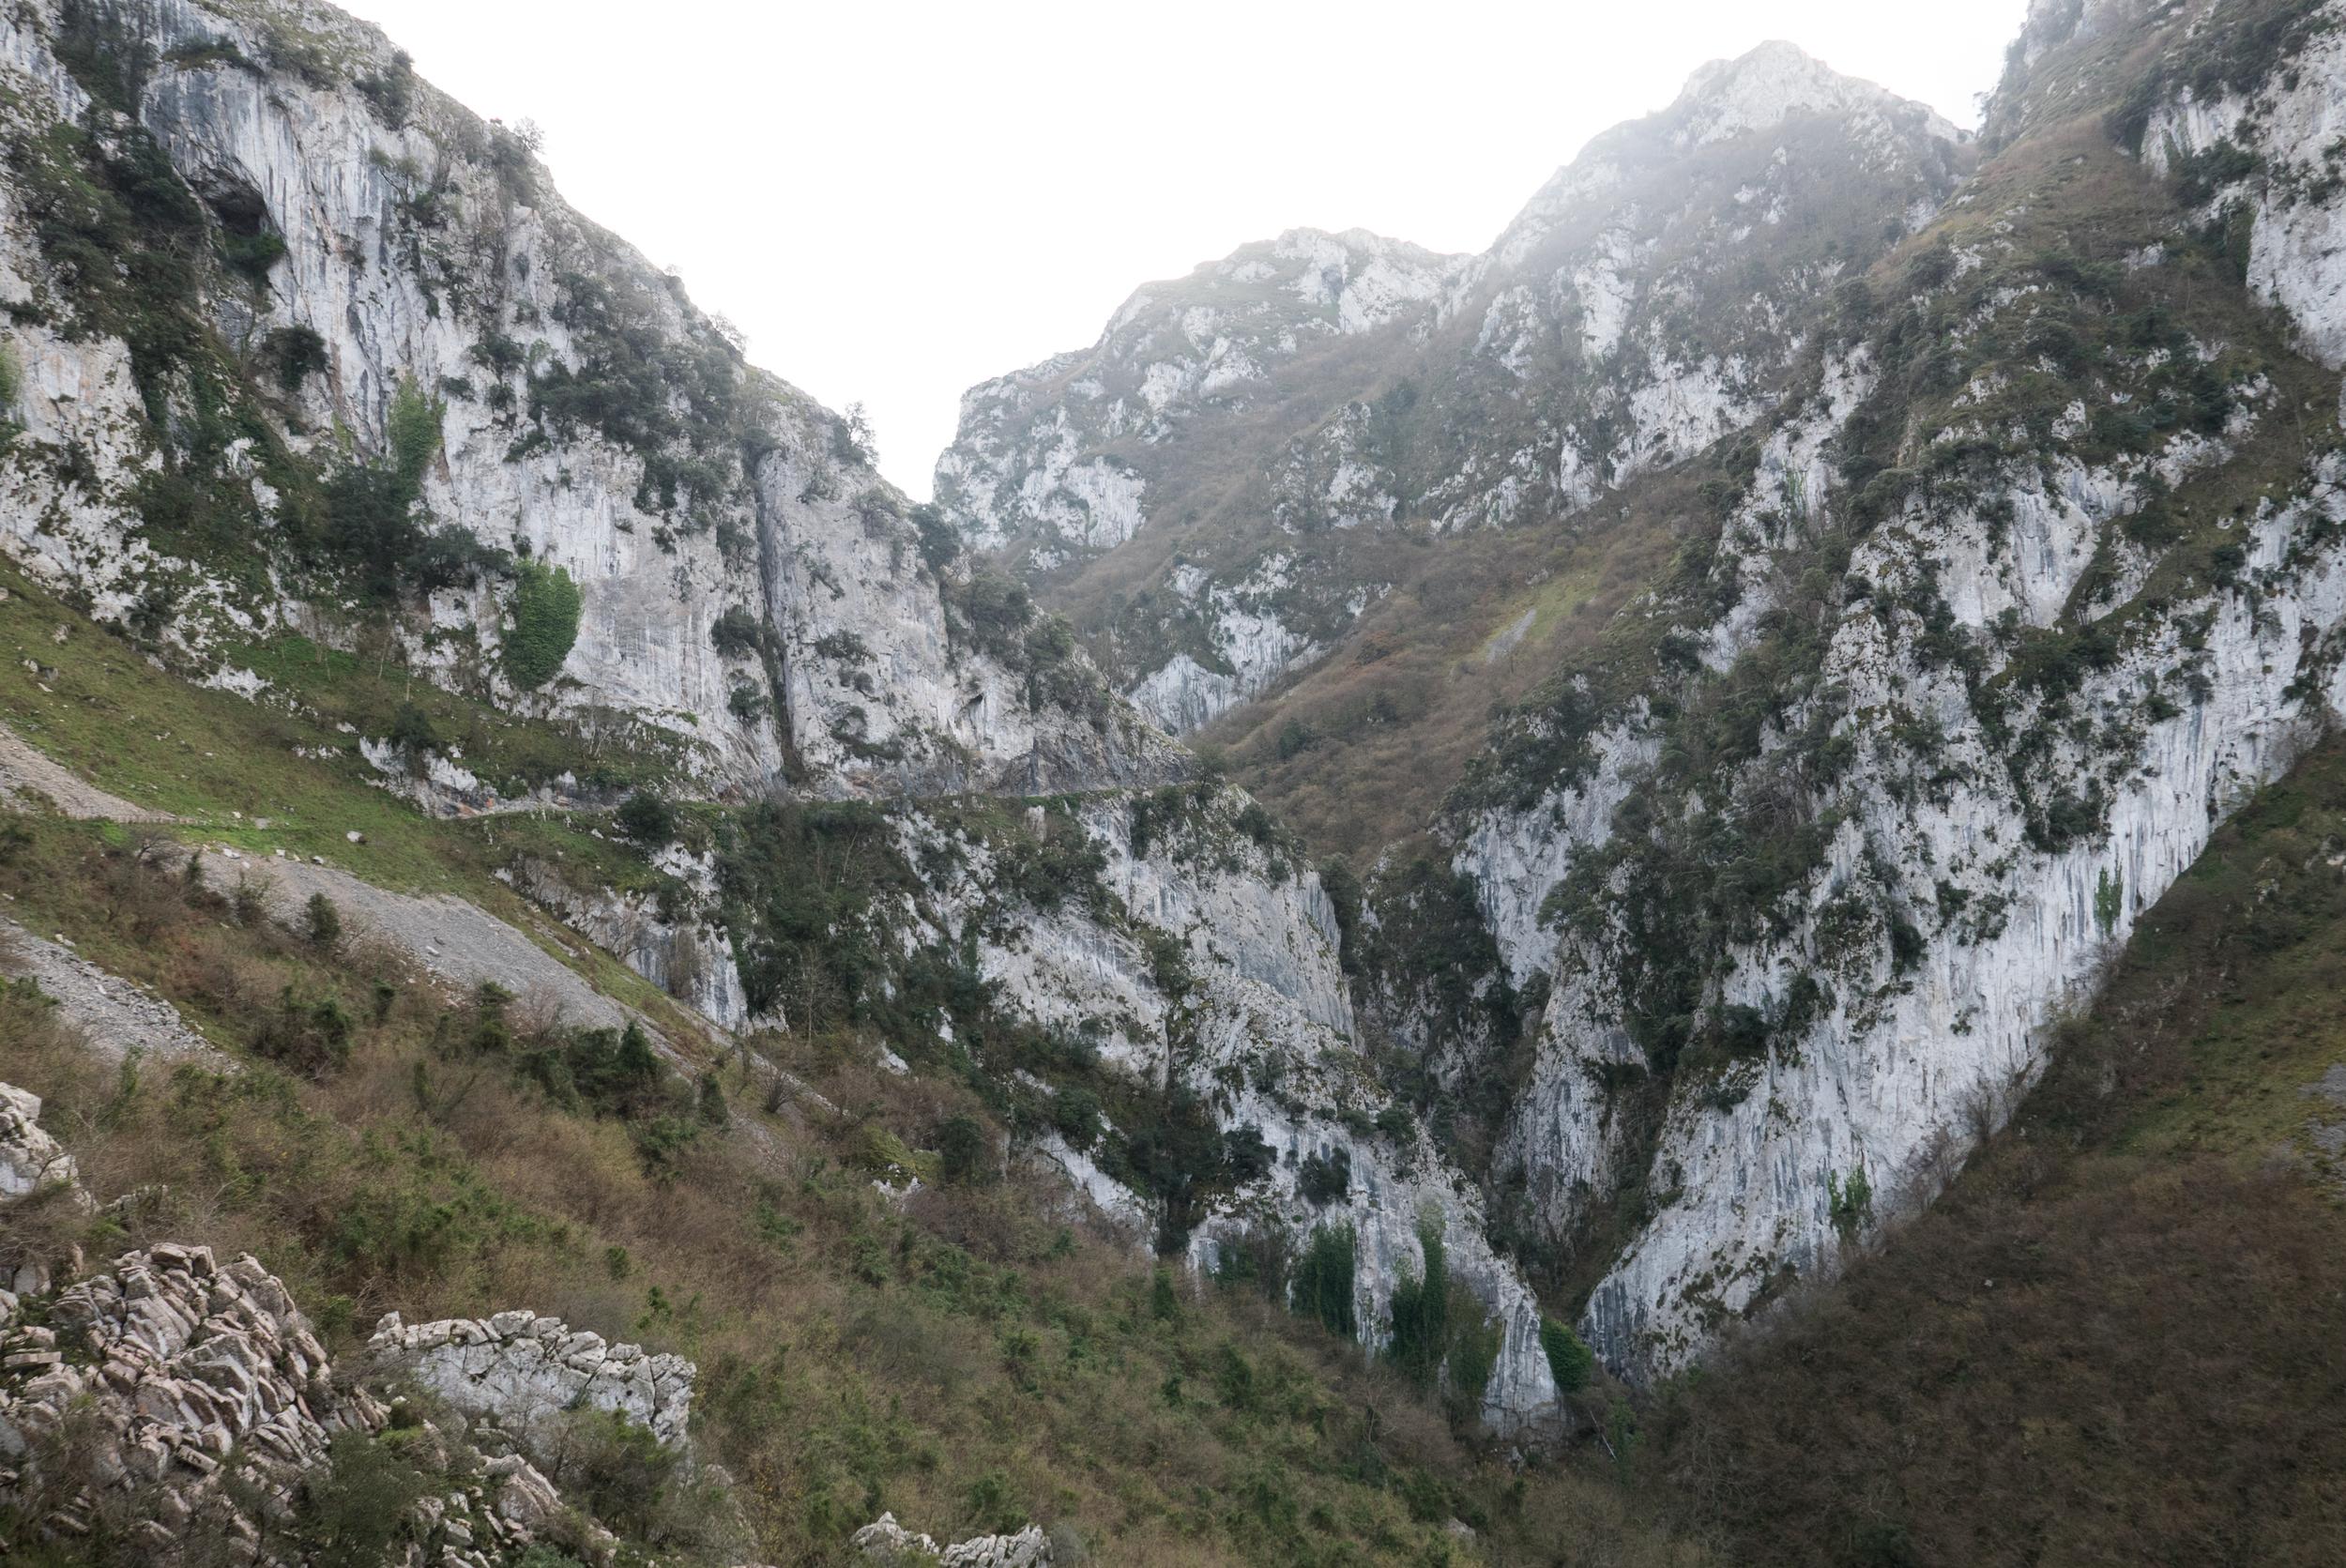 Las Xanas gorge, Asturian nature at its best